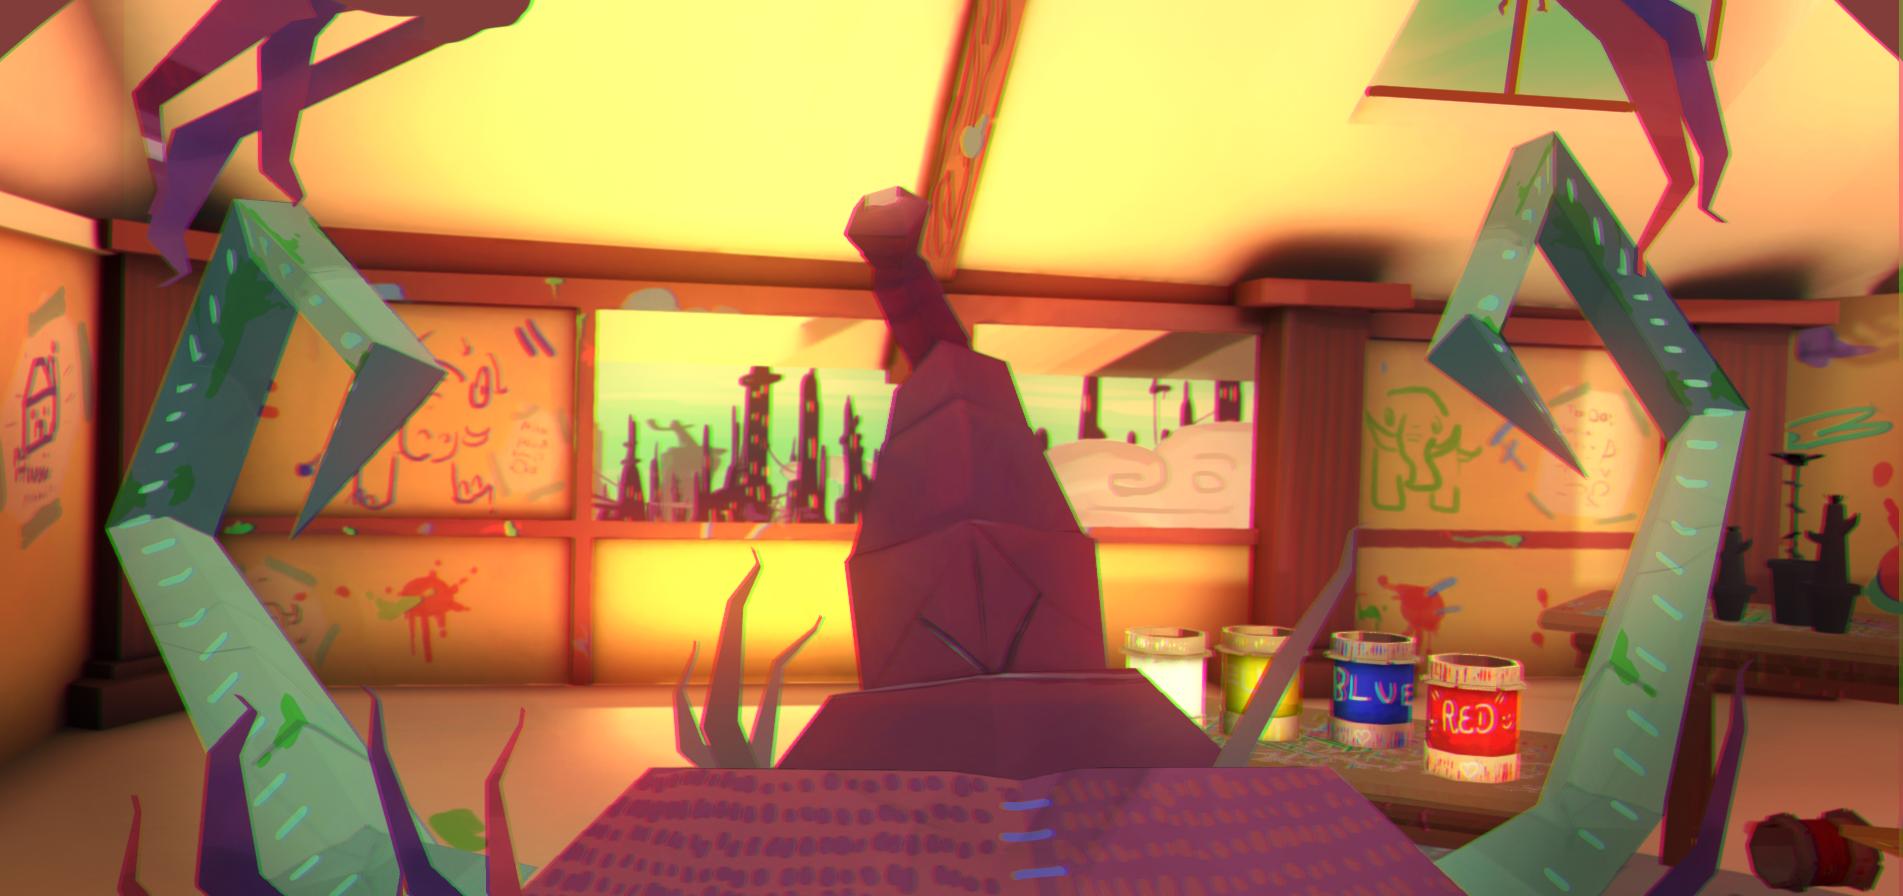 masterpiece-mammoth-max-piantoni-screenshot-2